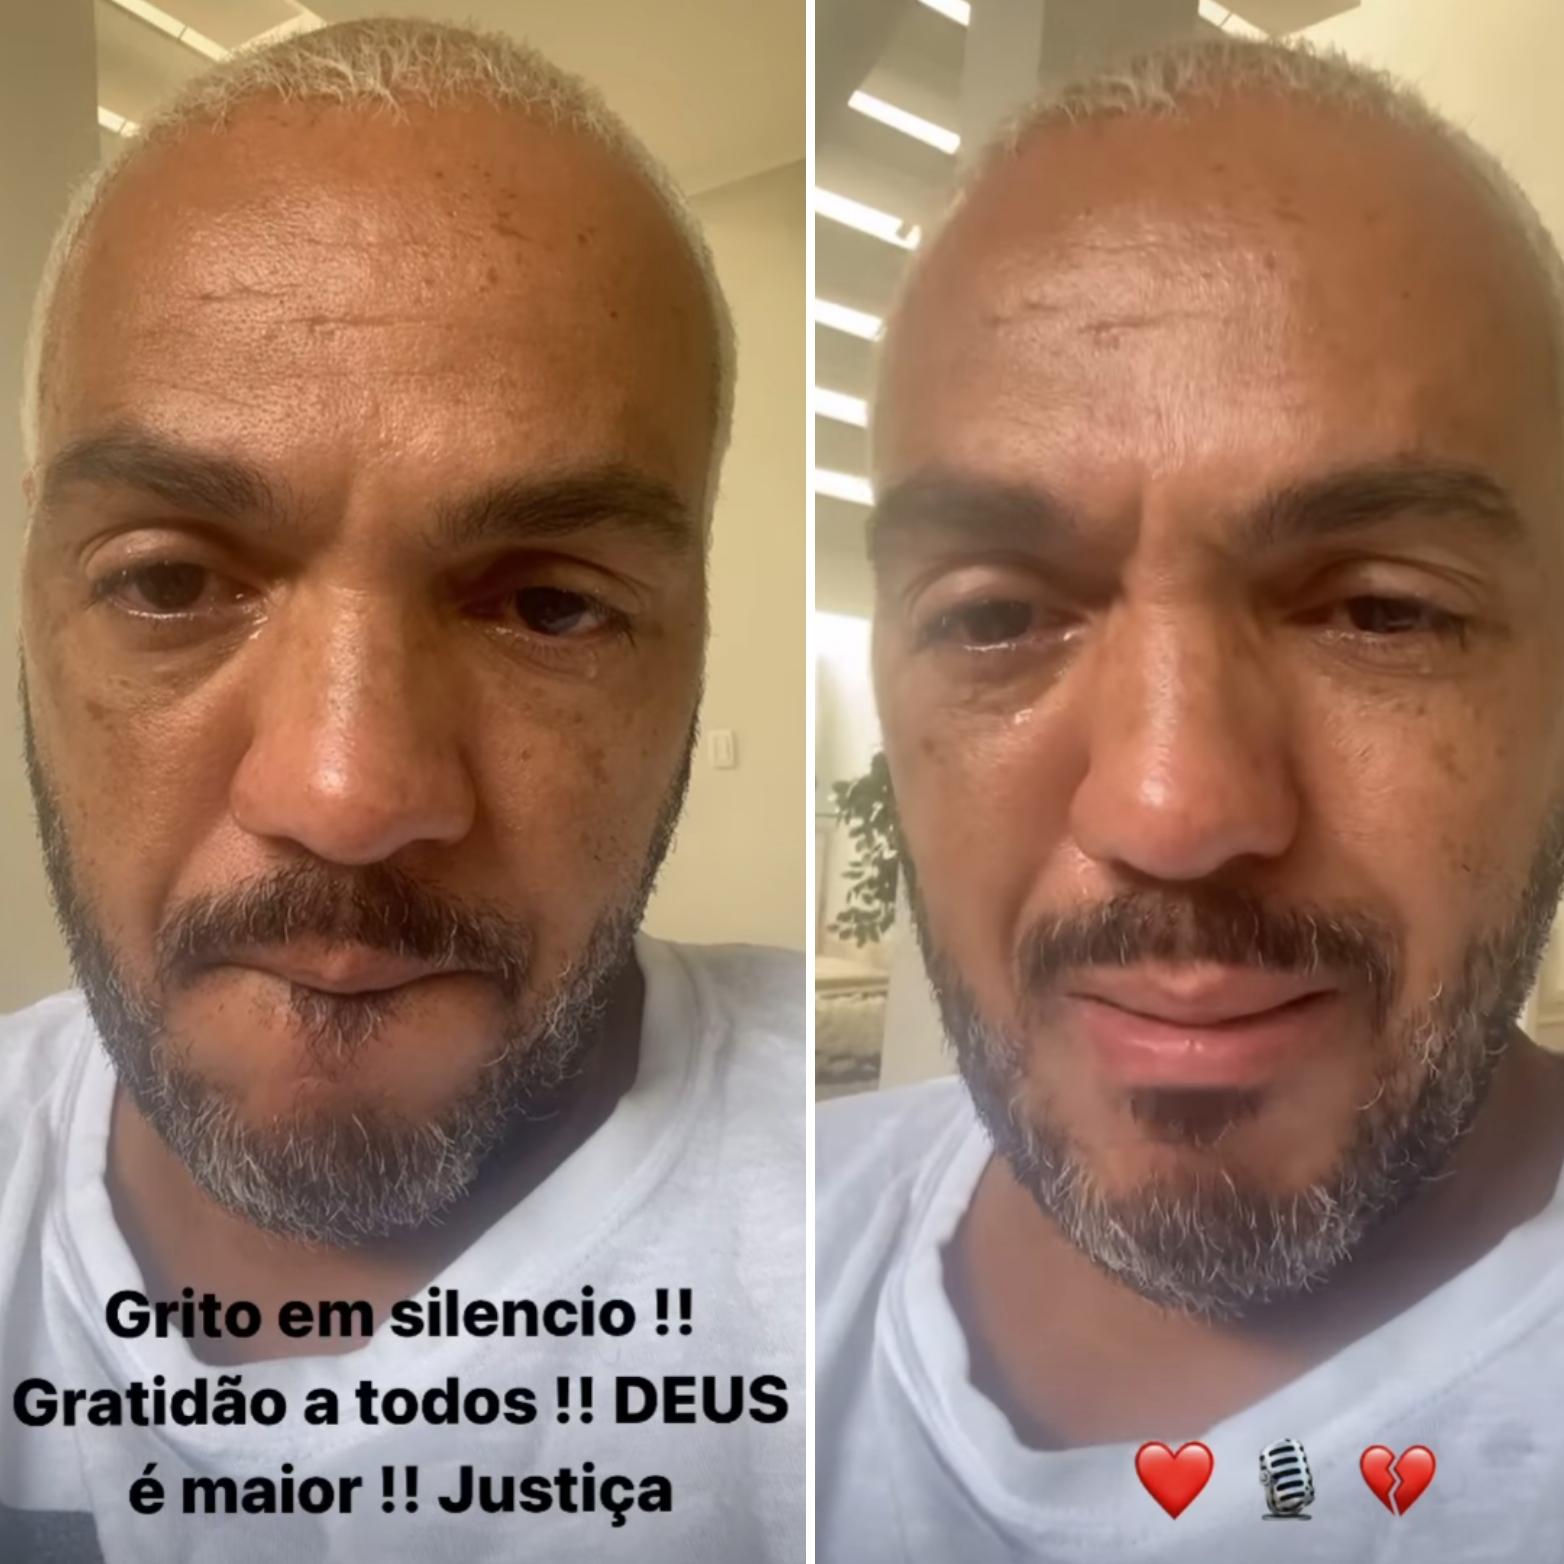 Belo chora após deixar prisão. Veja vídeo!